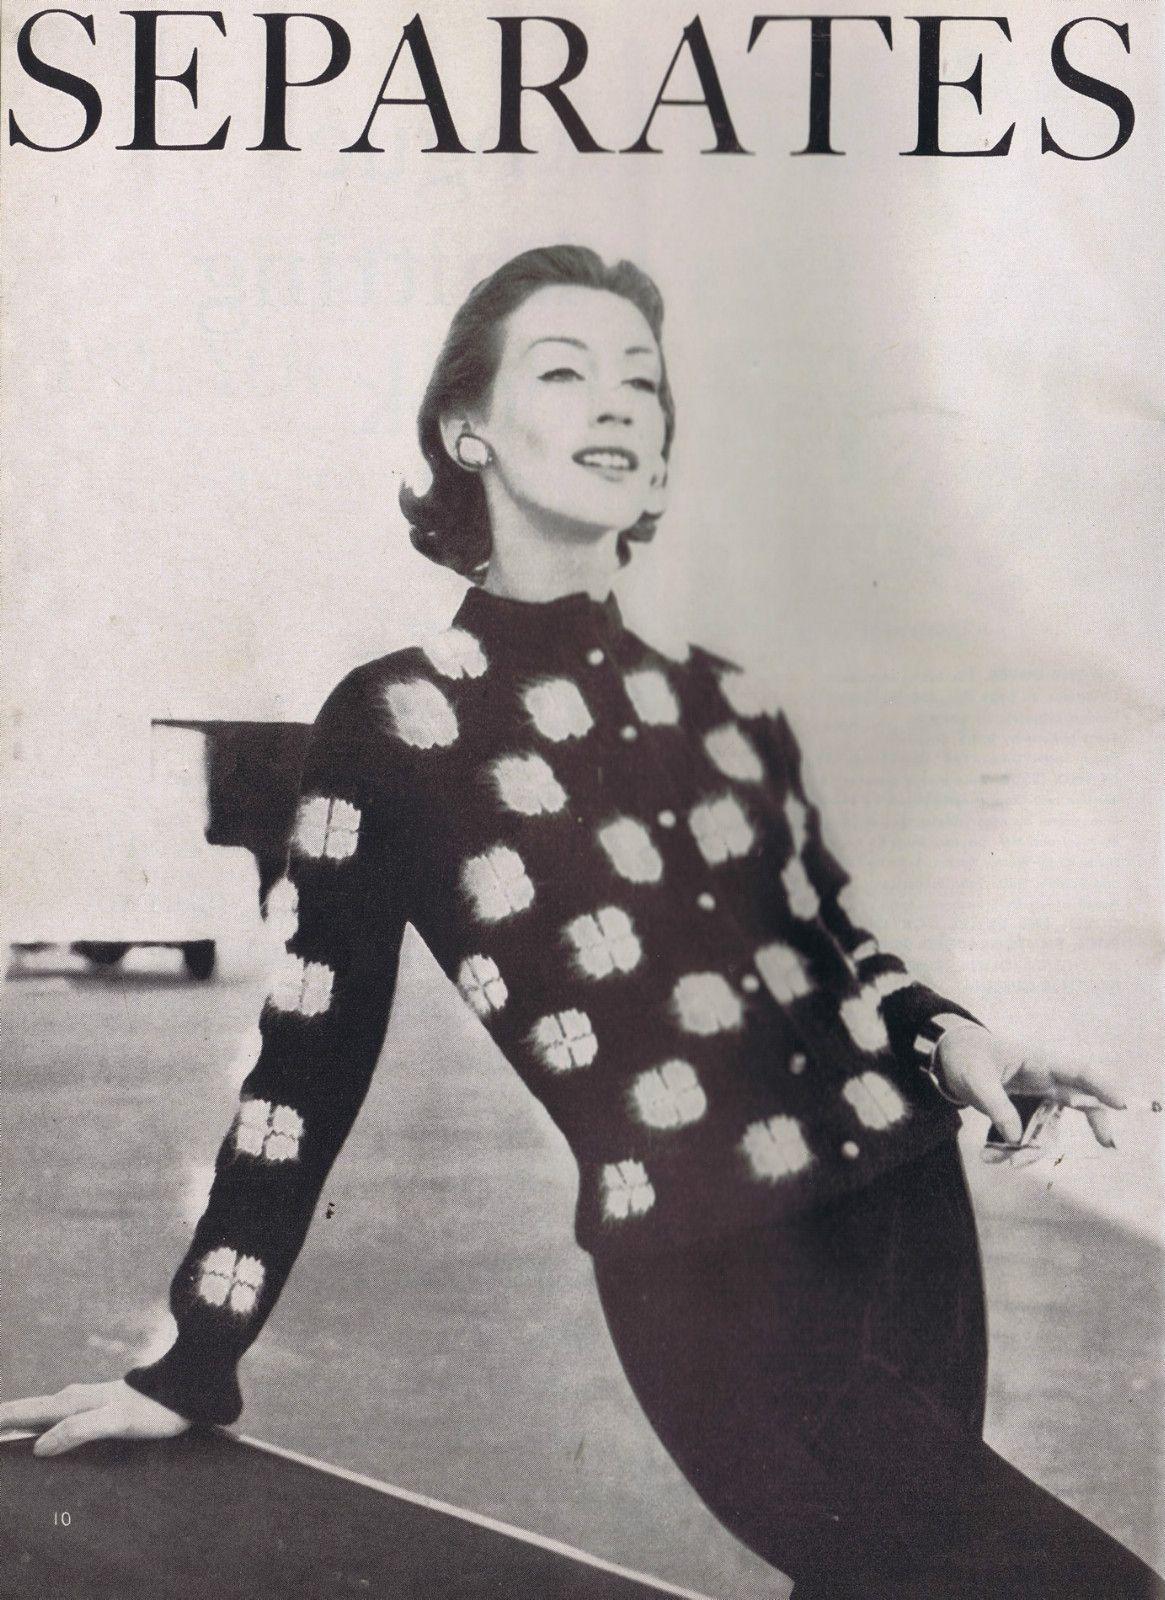 Vintage 50s vogue knitting patterns cardigan stole pullover coats vintage 50s vogue knitting patterns cardigan stole pullover coats jacket dresses ebay bankloansurffo Choice Image